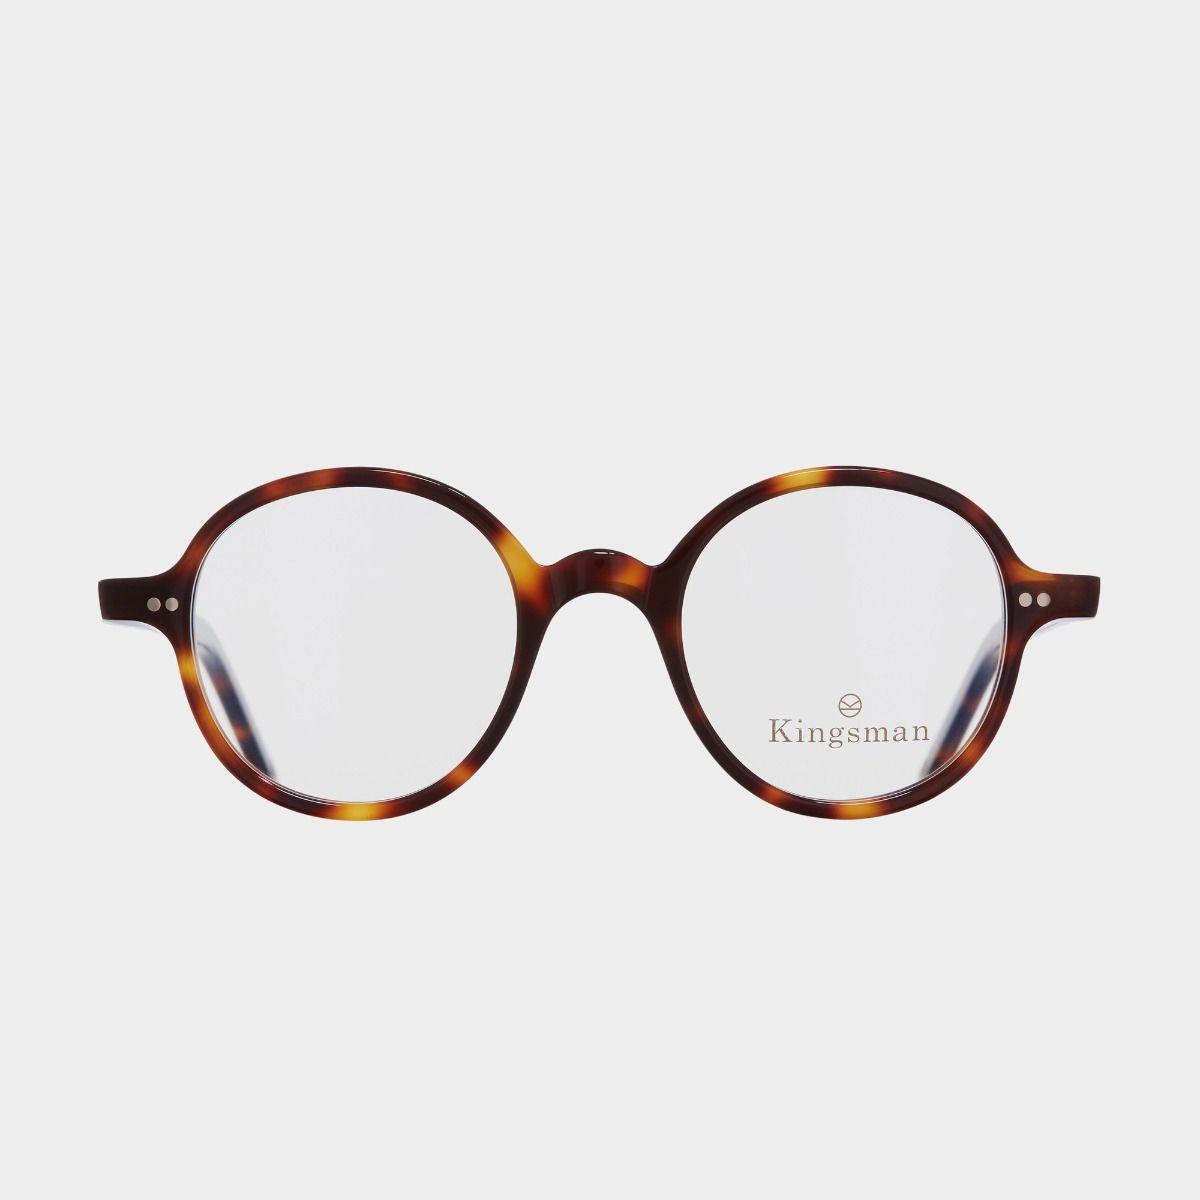 9001 Kingsman Optical Round Glasses